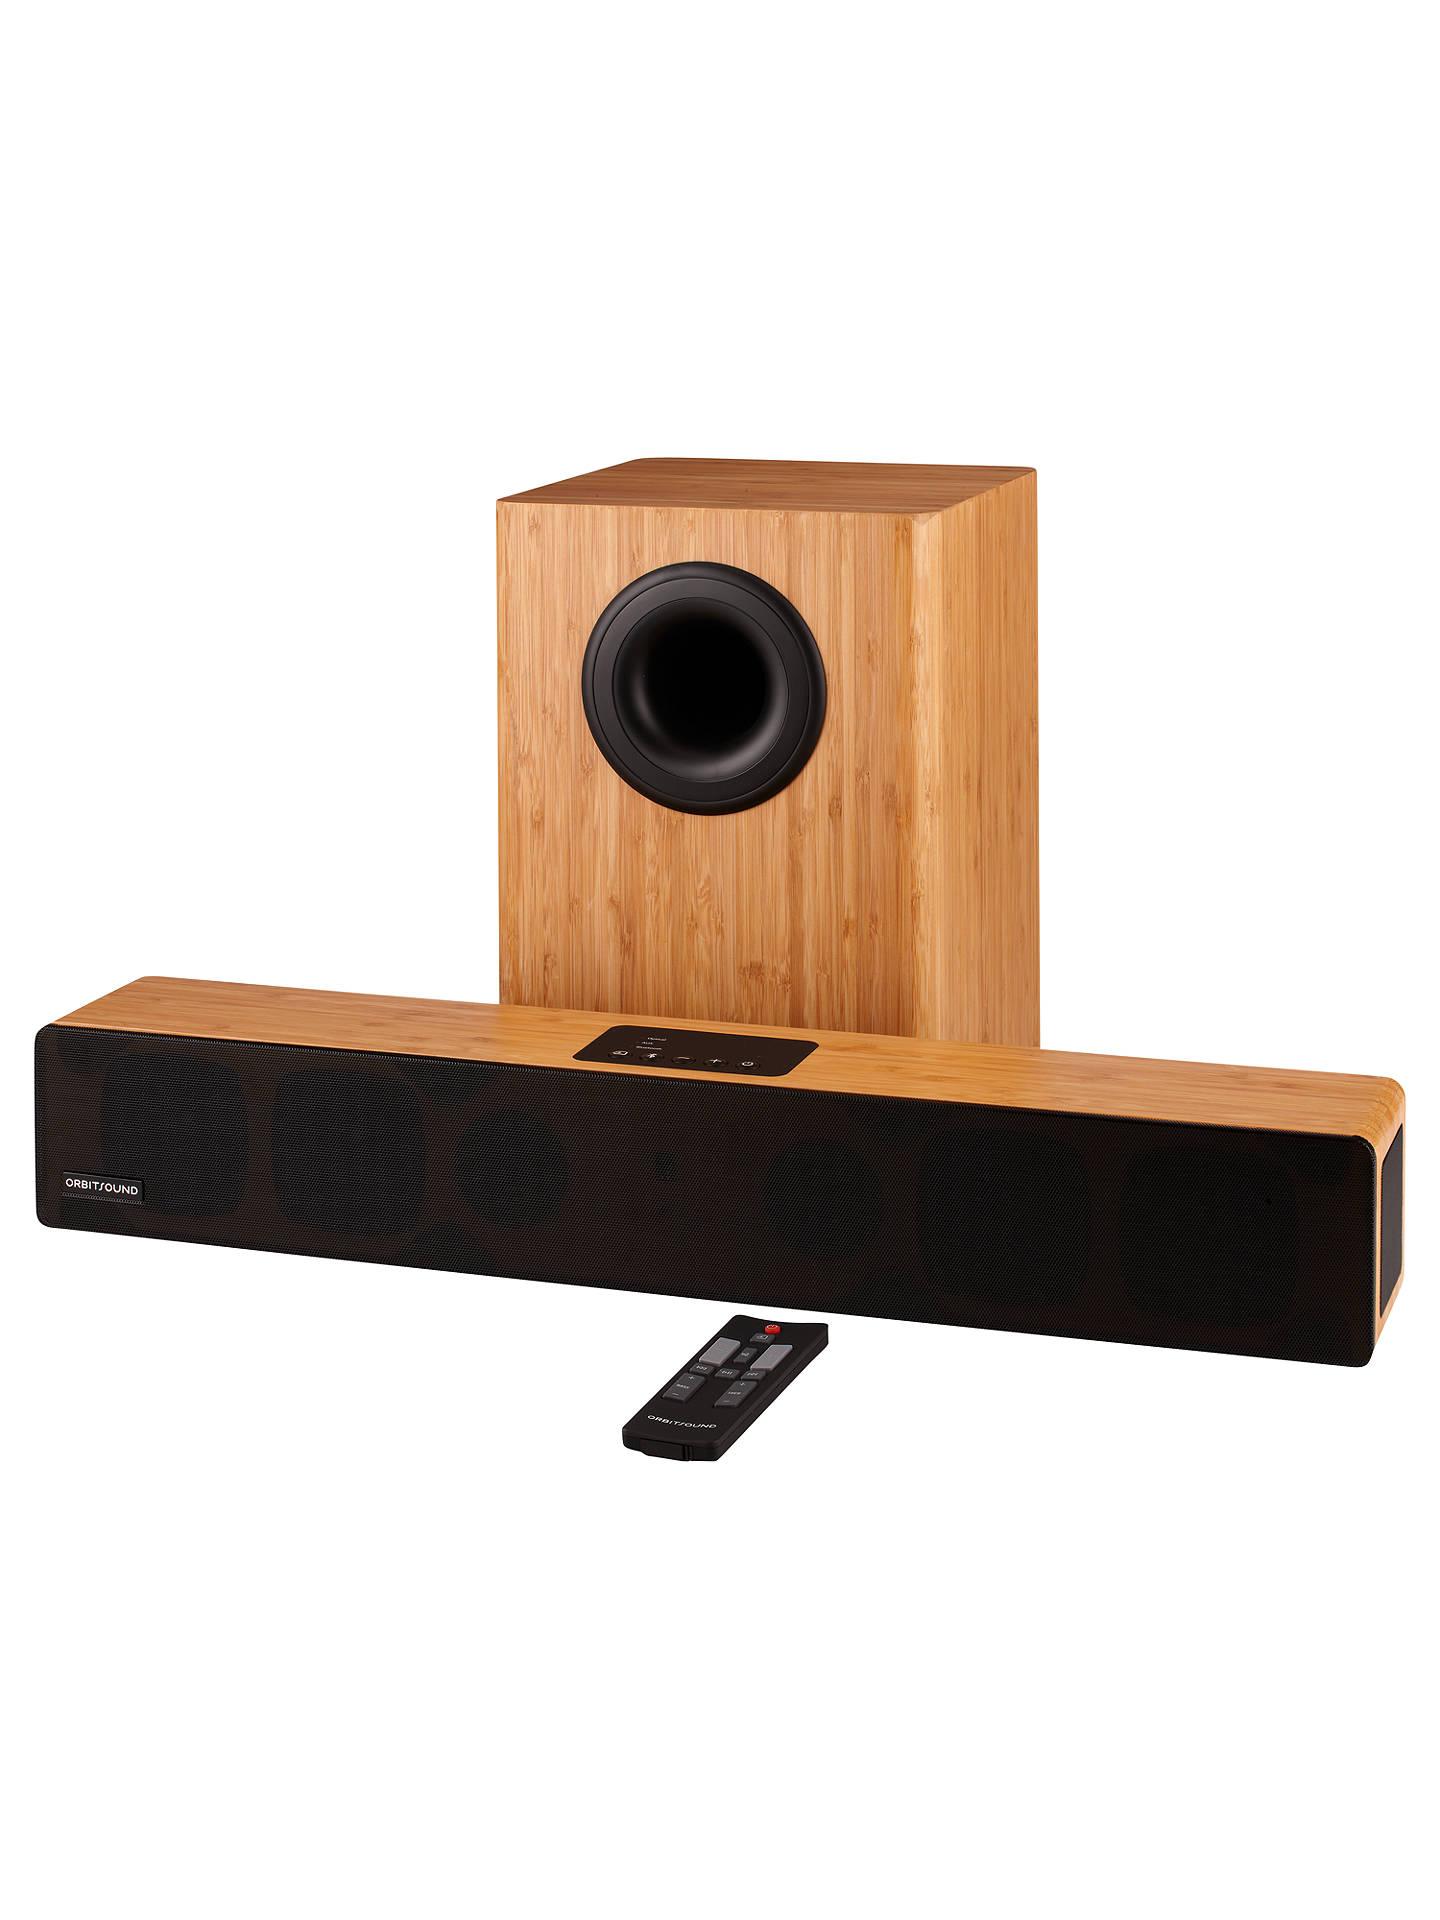 orbitsound m12 bluetooth sound bar with wireless subwoofer. Black Bedroom Furniture Sets. Home Design Ideas